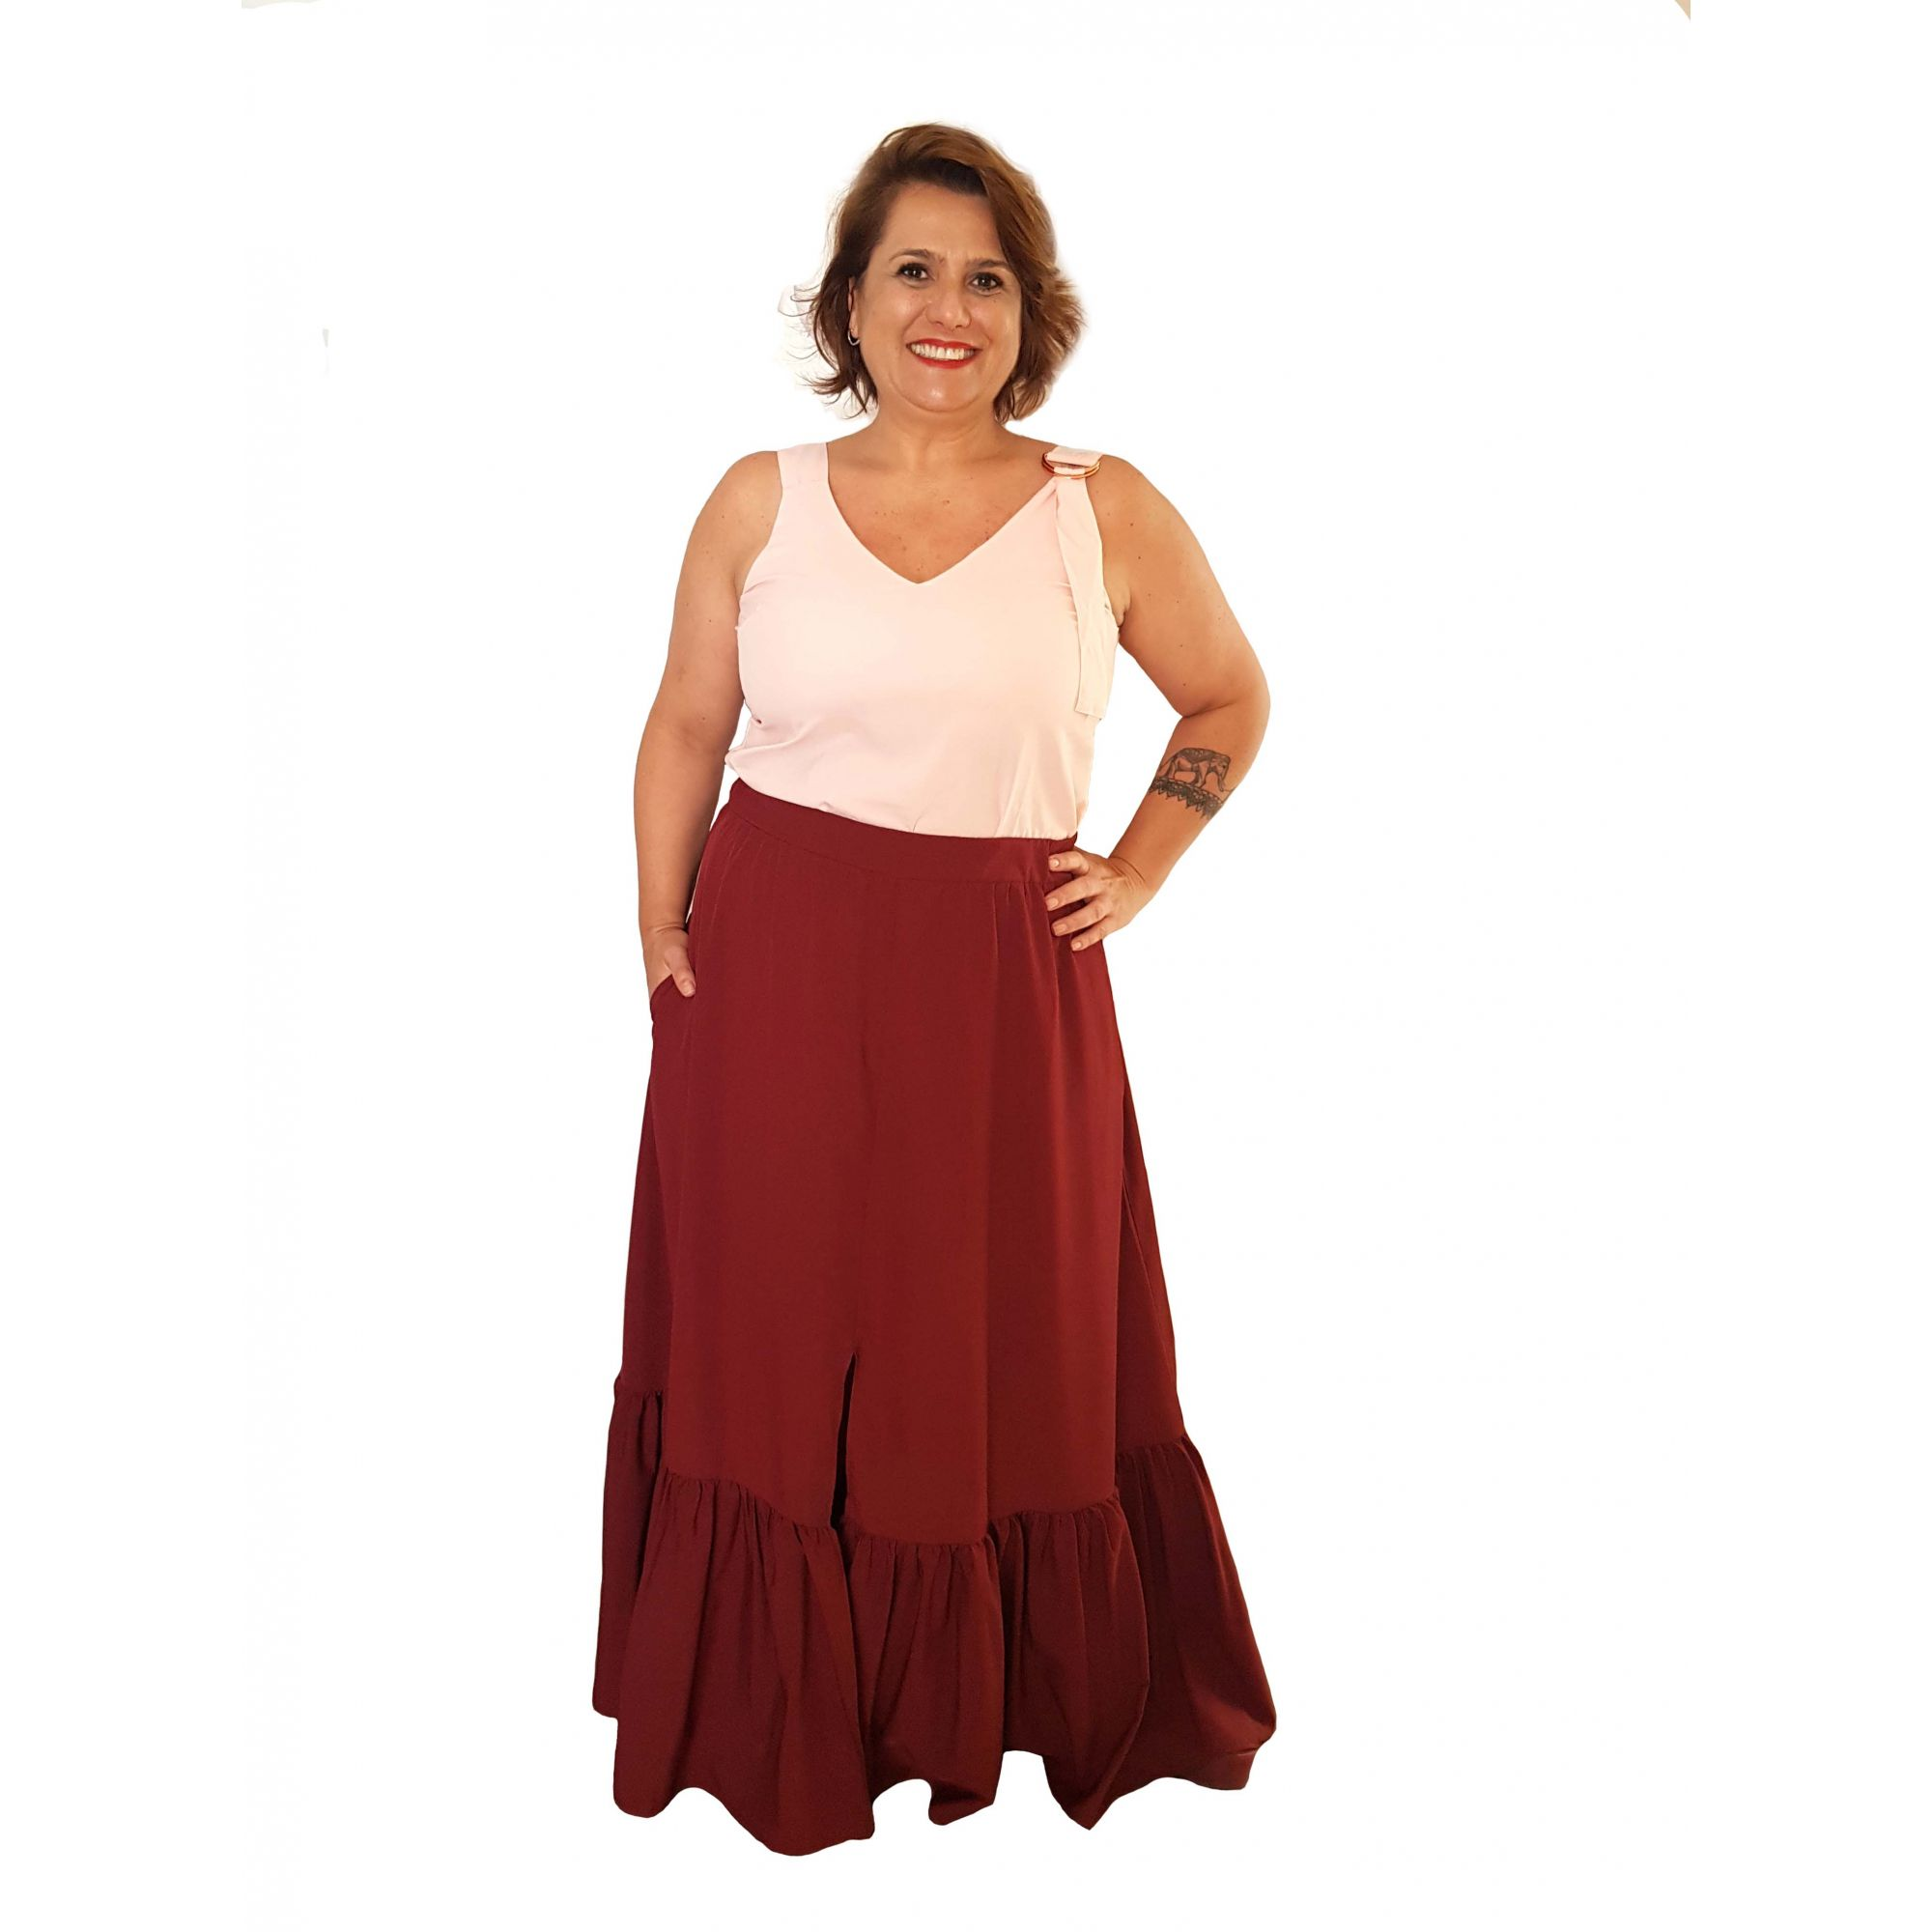 Saia Longa Babado Plus Size Marsala Vermelha